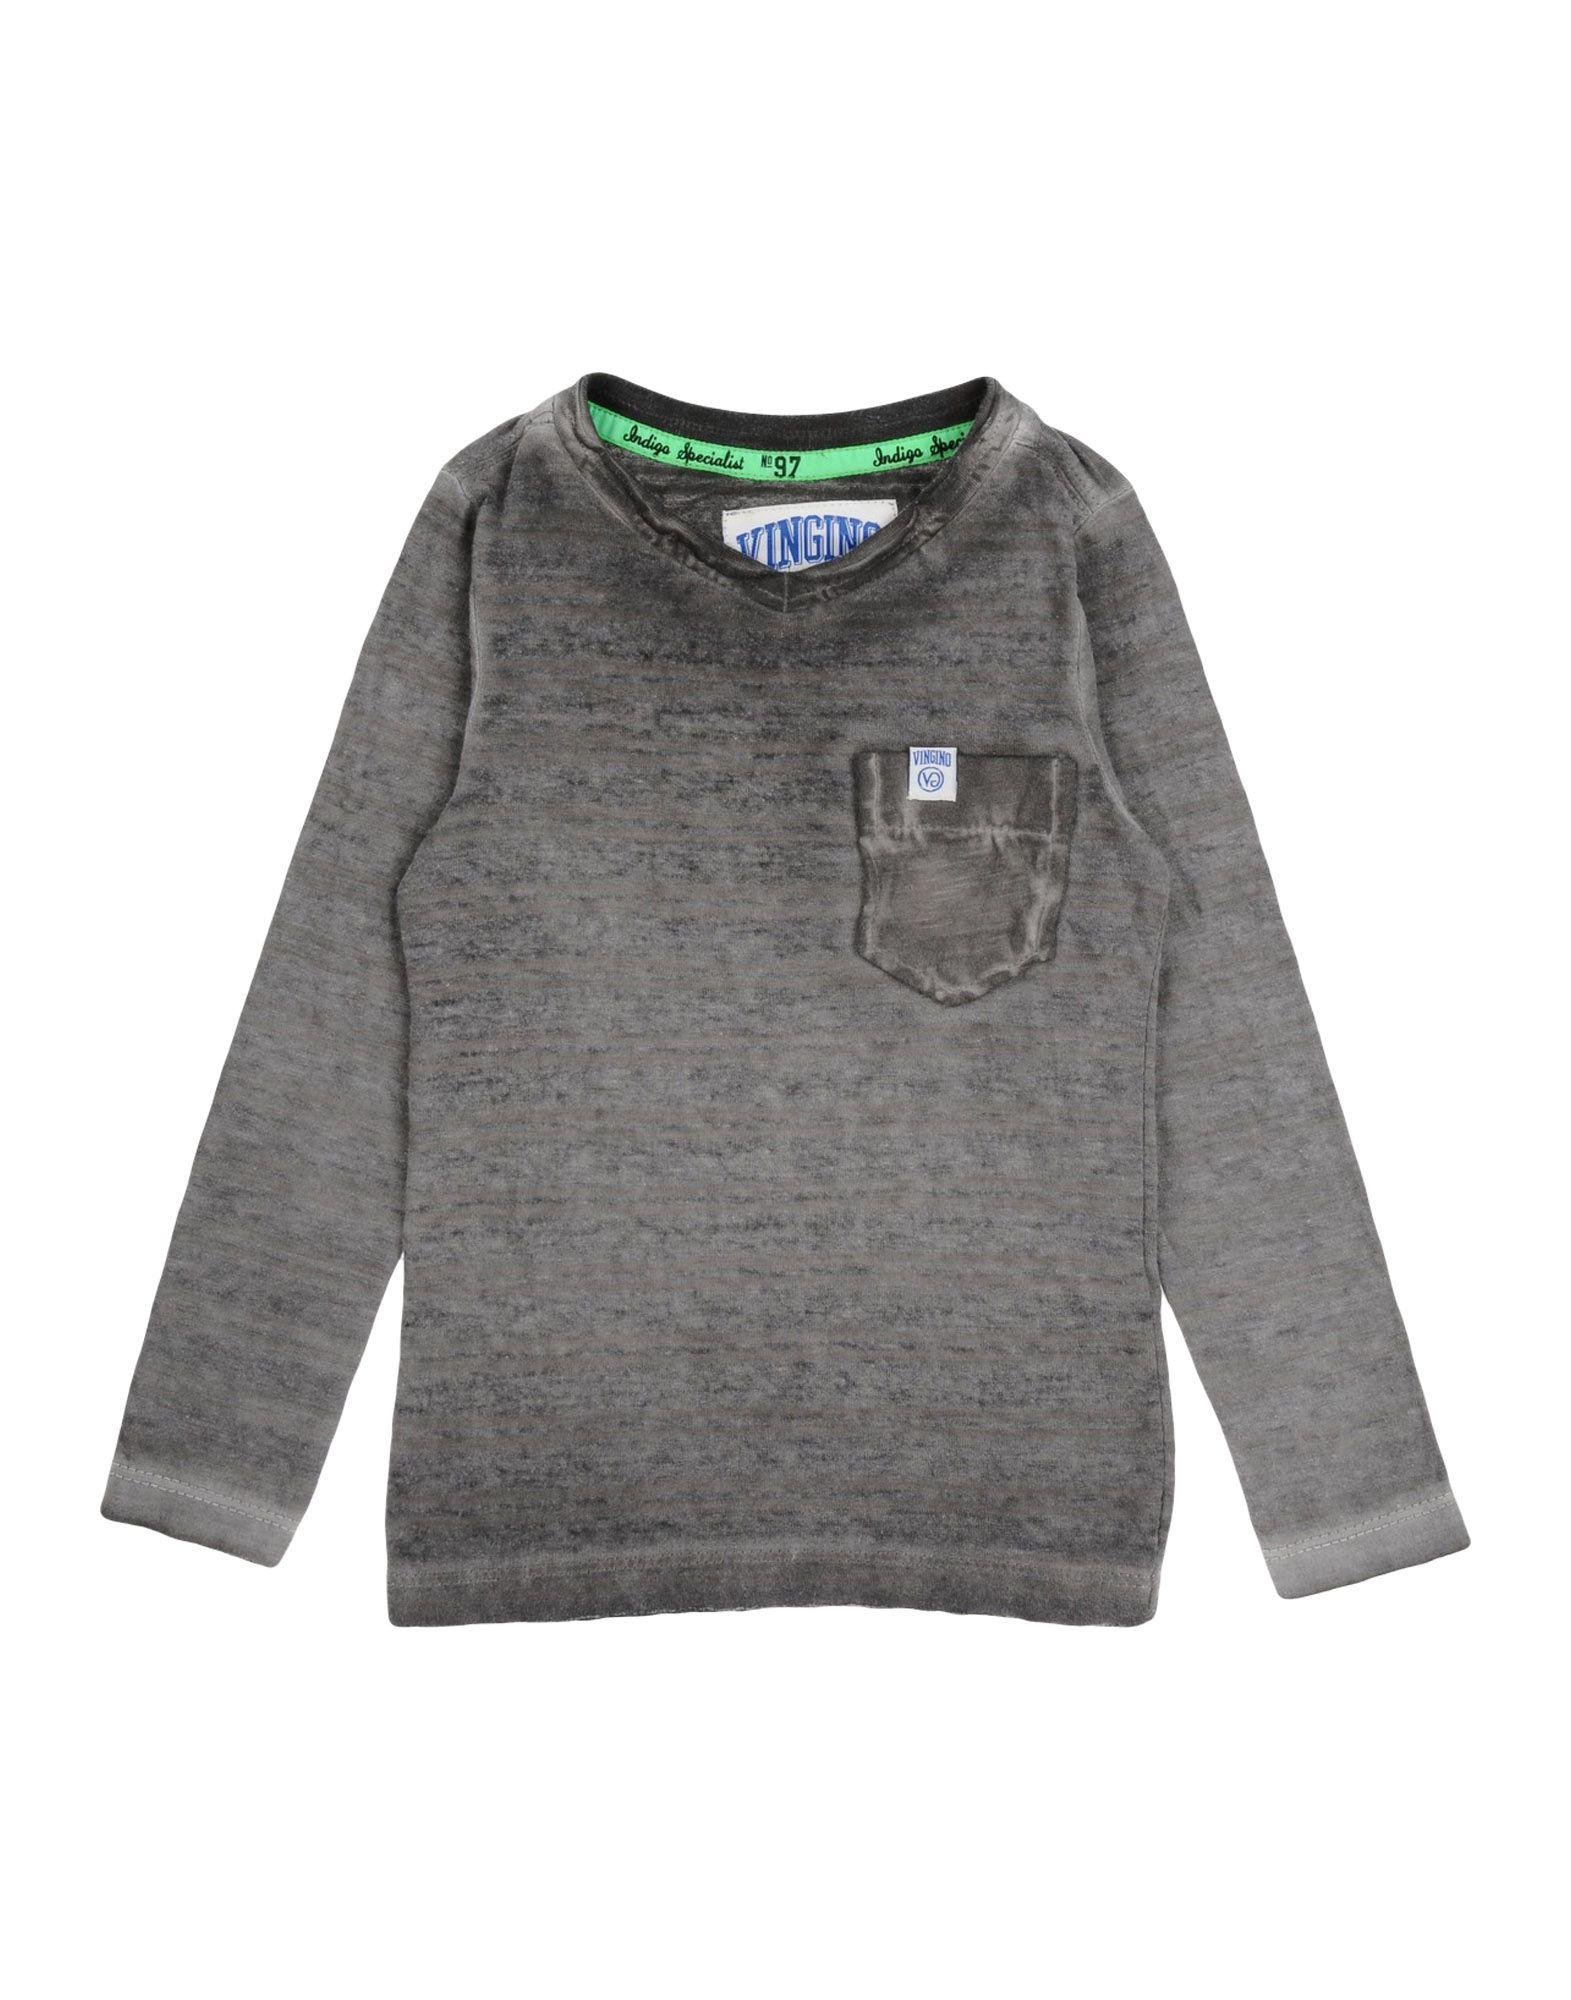 d4539db481589f Vingino T-Shirt Boy 0-24 months online on YOOX United States